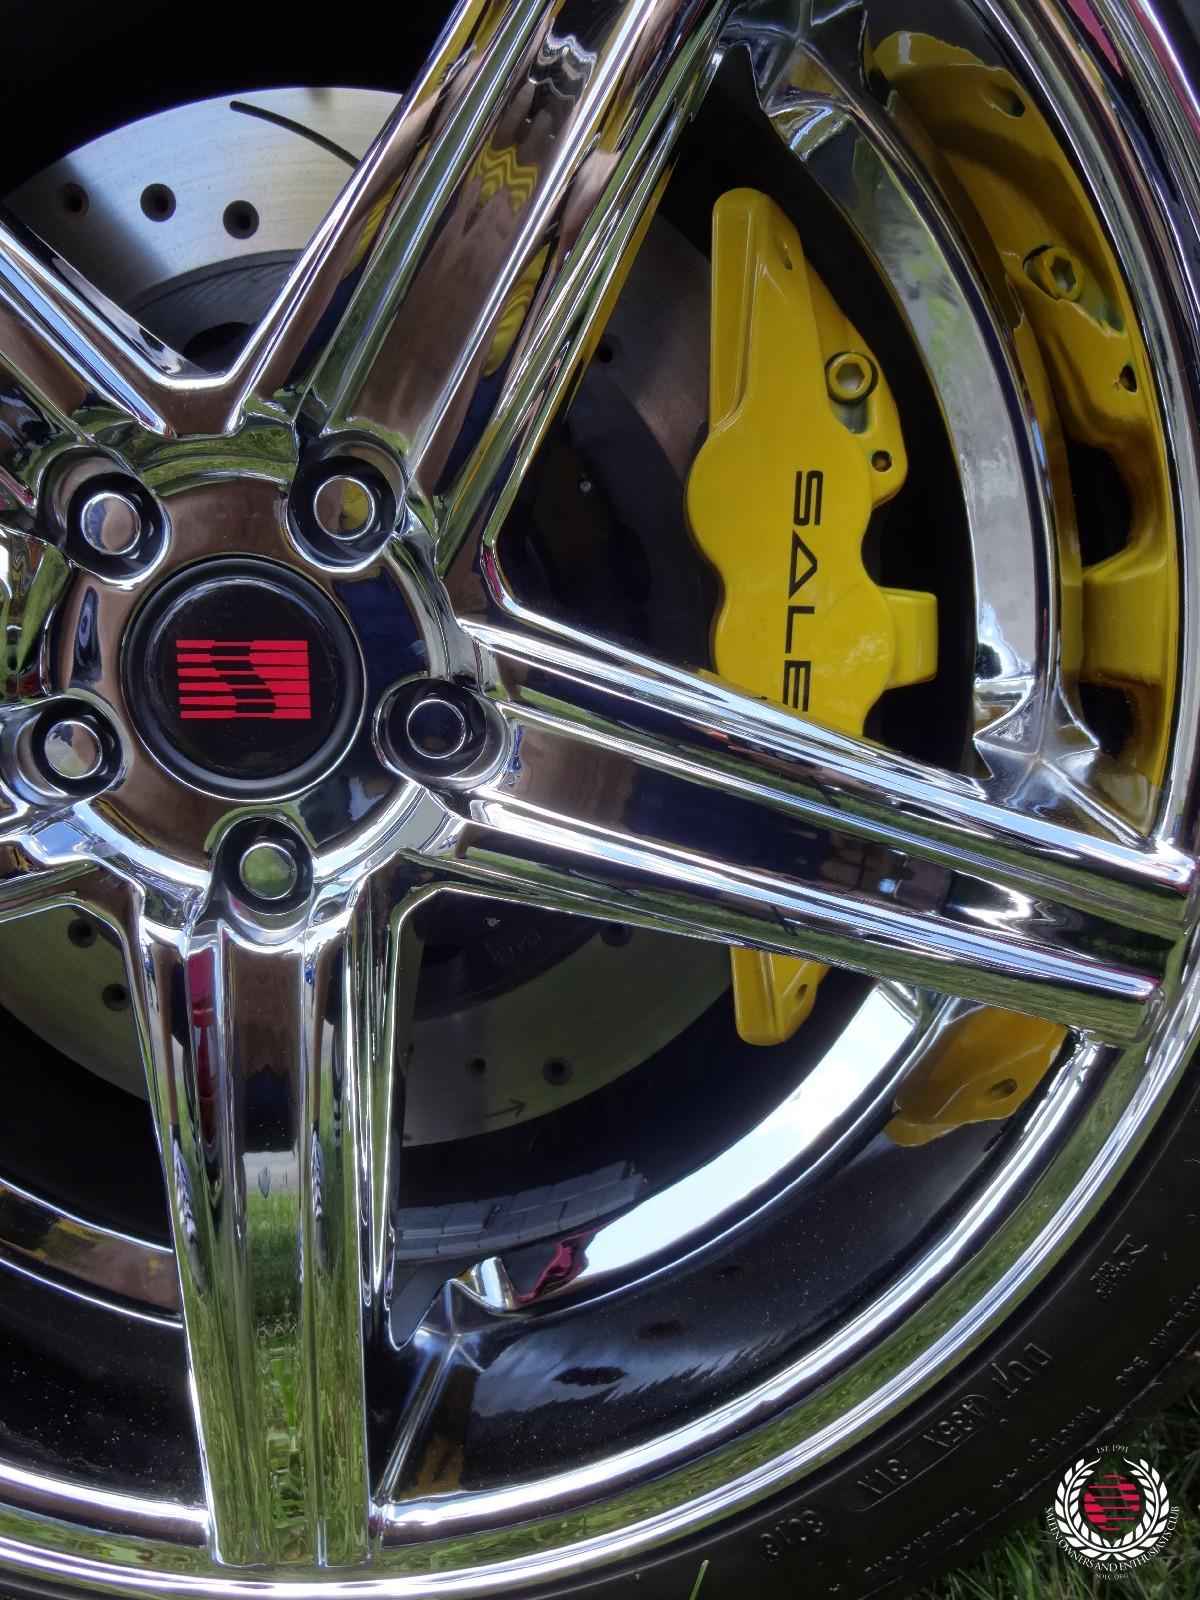 17-0032 S302 Yellow Label